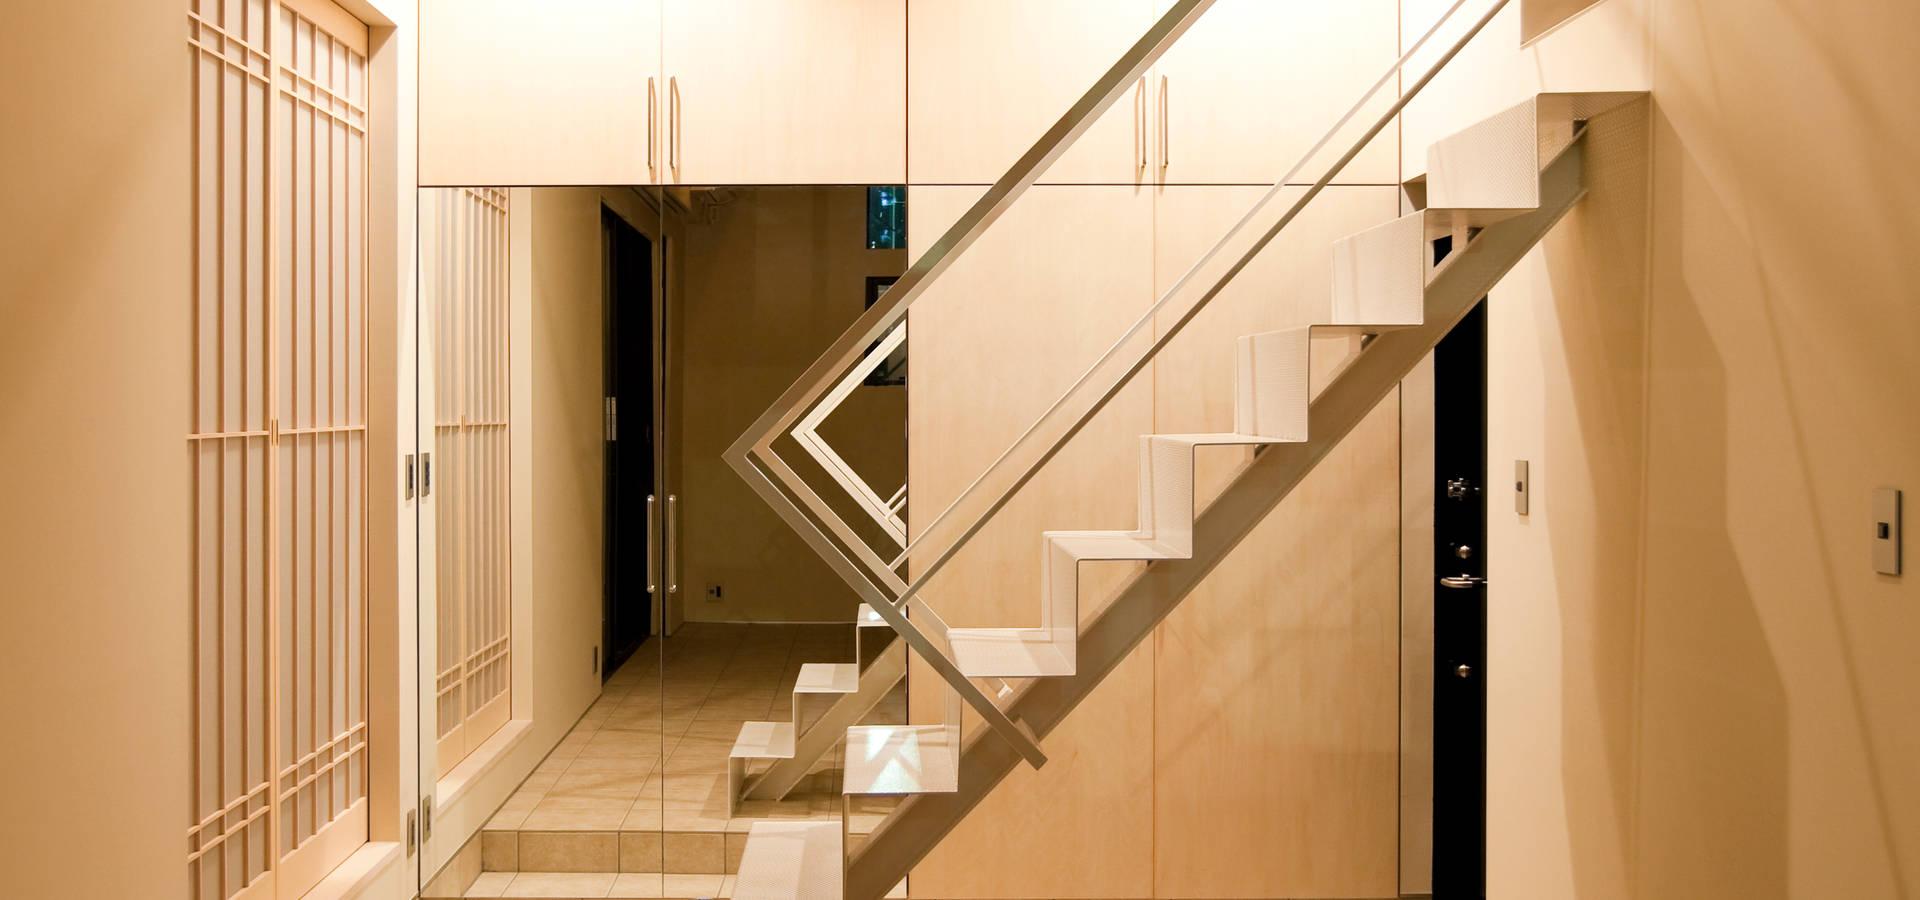 Marmo Architects